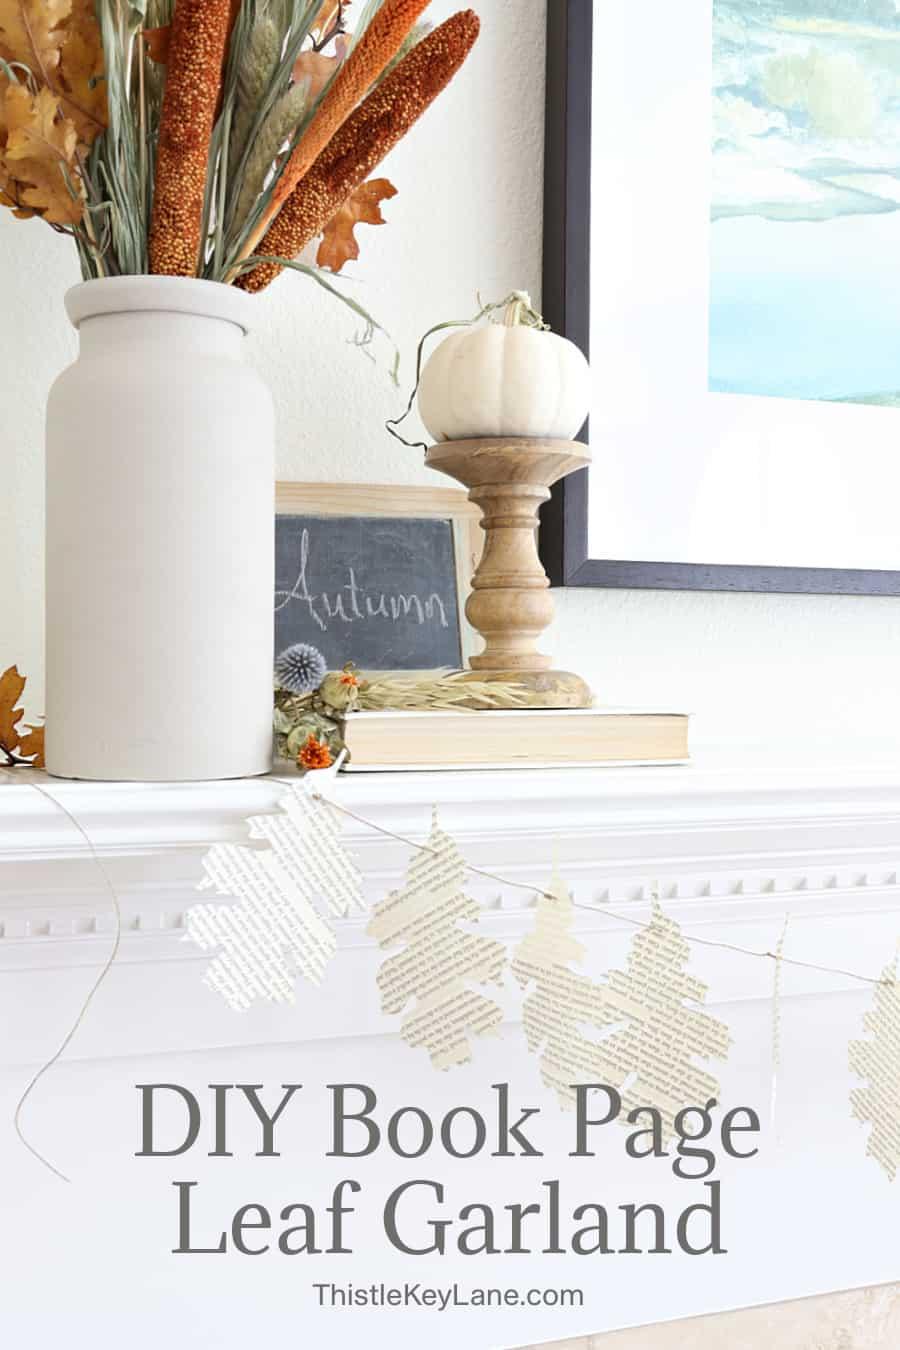 DIY Book Page Leaf Garland.